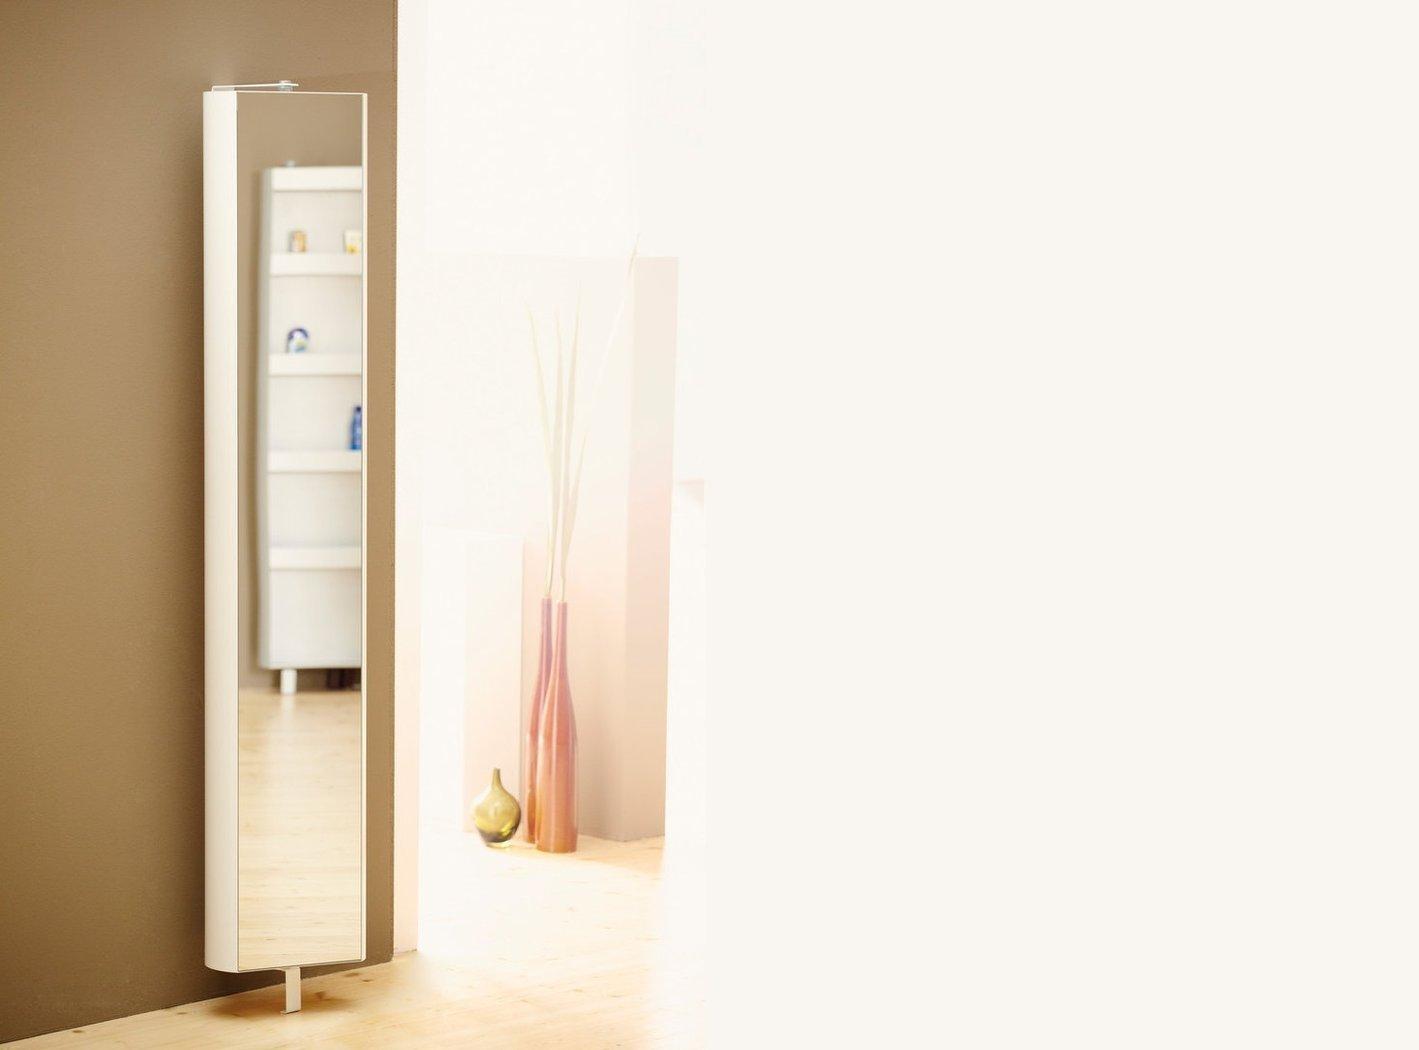 Jan kurtz multi tube m garderobe teakwoodstore24 for Garderobe jan kurtz